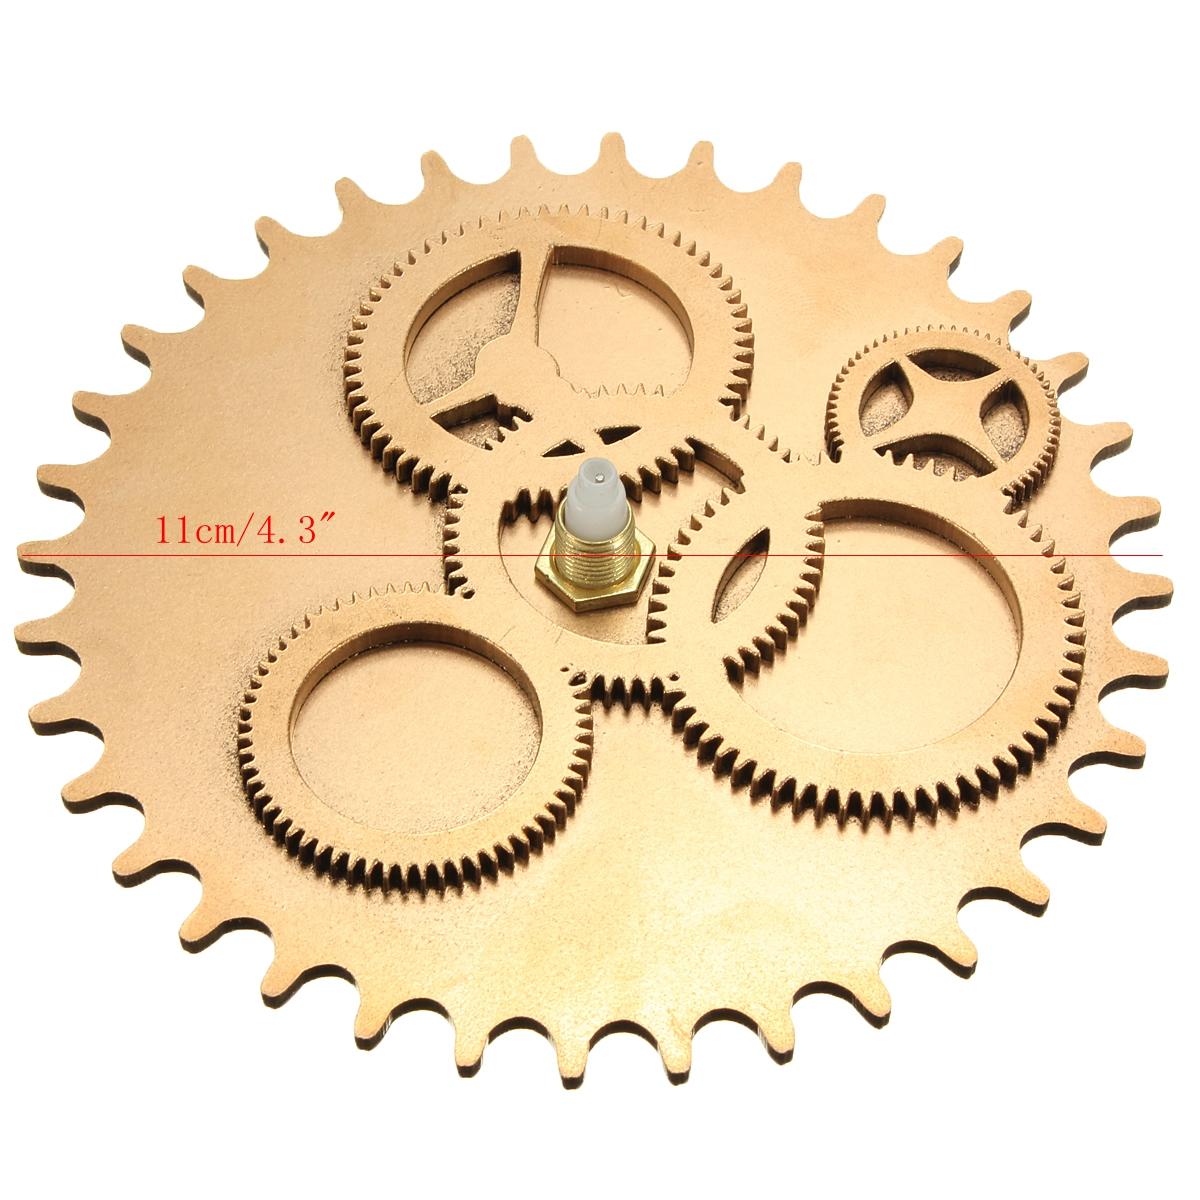 Gold 3D Vintage DIY Mechanism Retro Gear Large Hand Wall Clock Home ...